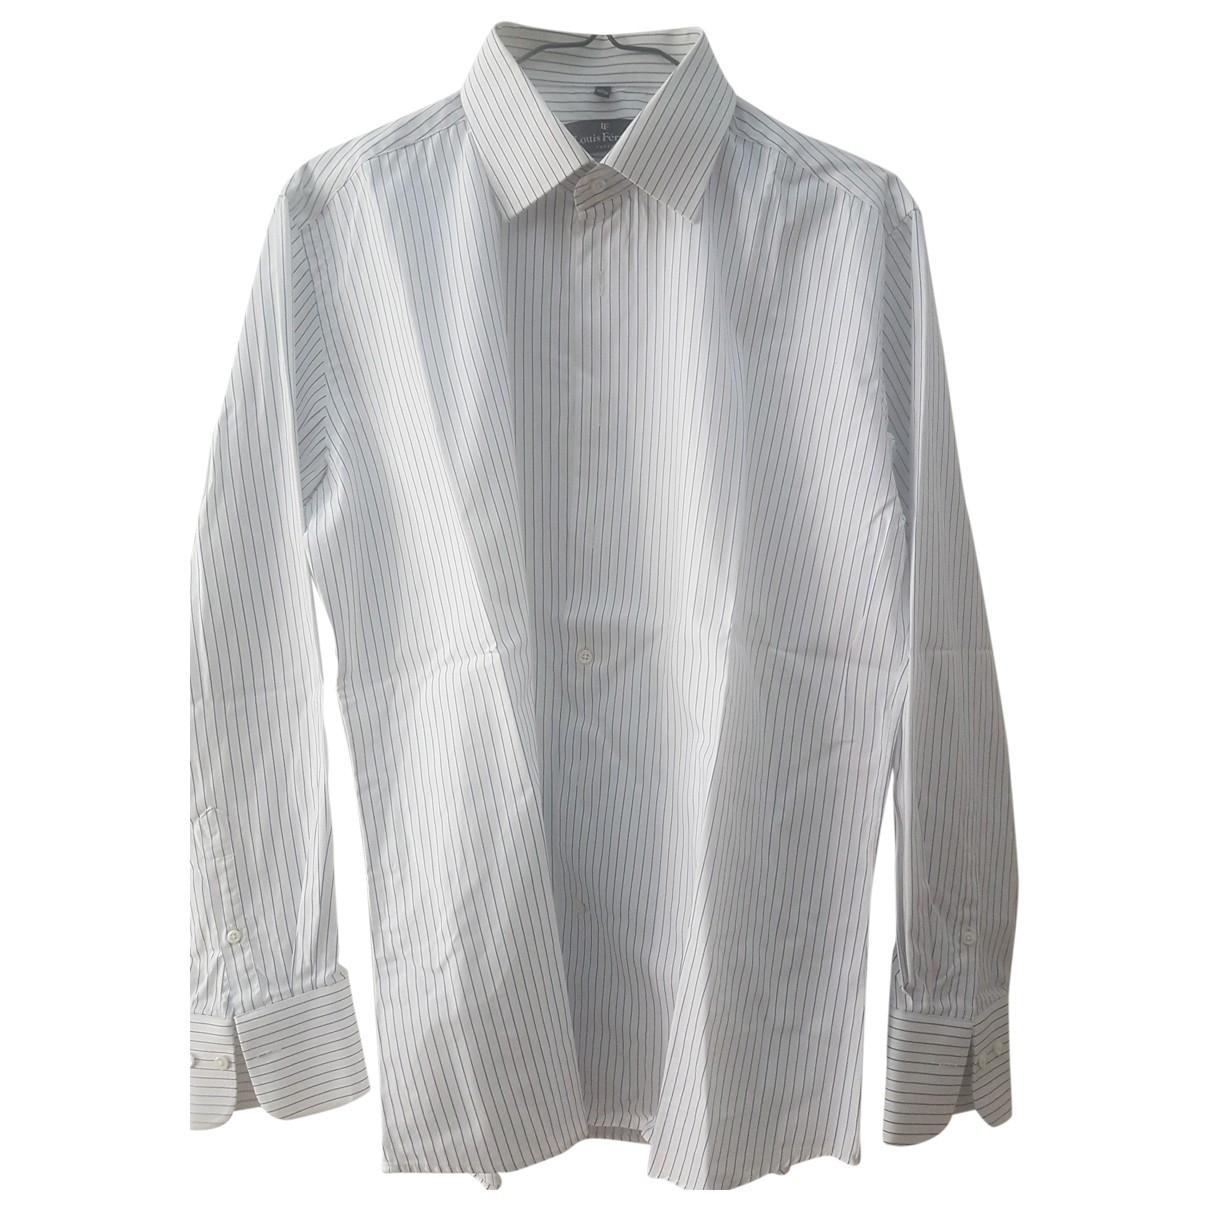 Louis Feraud \N White Cotton Shirts for Men L International